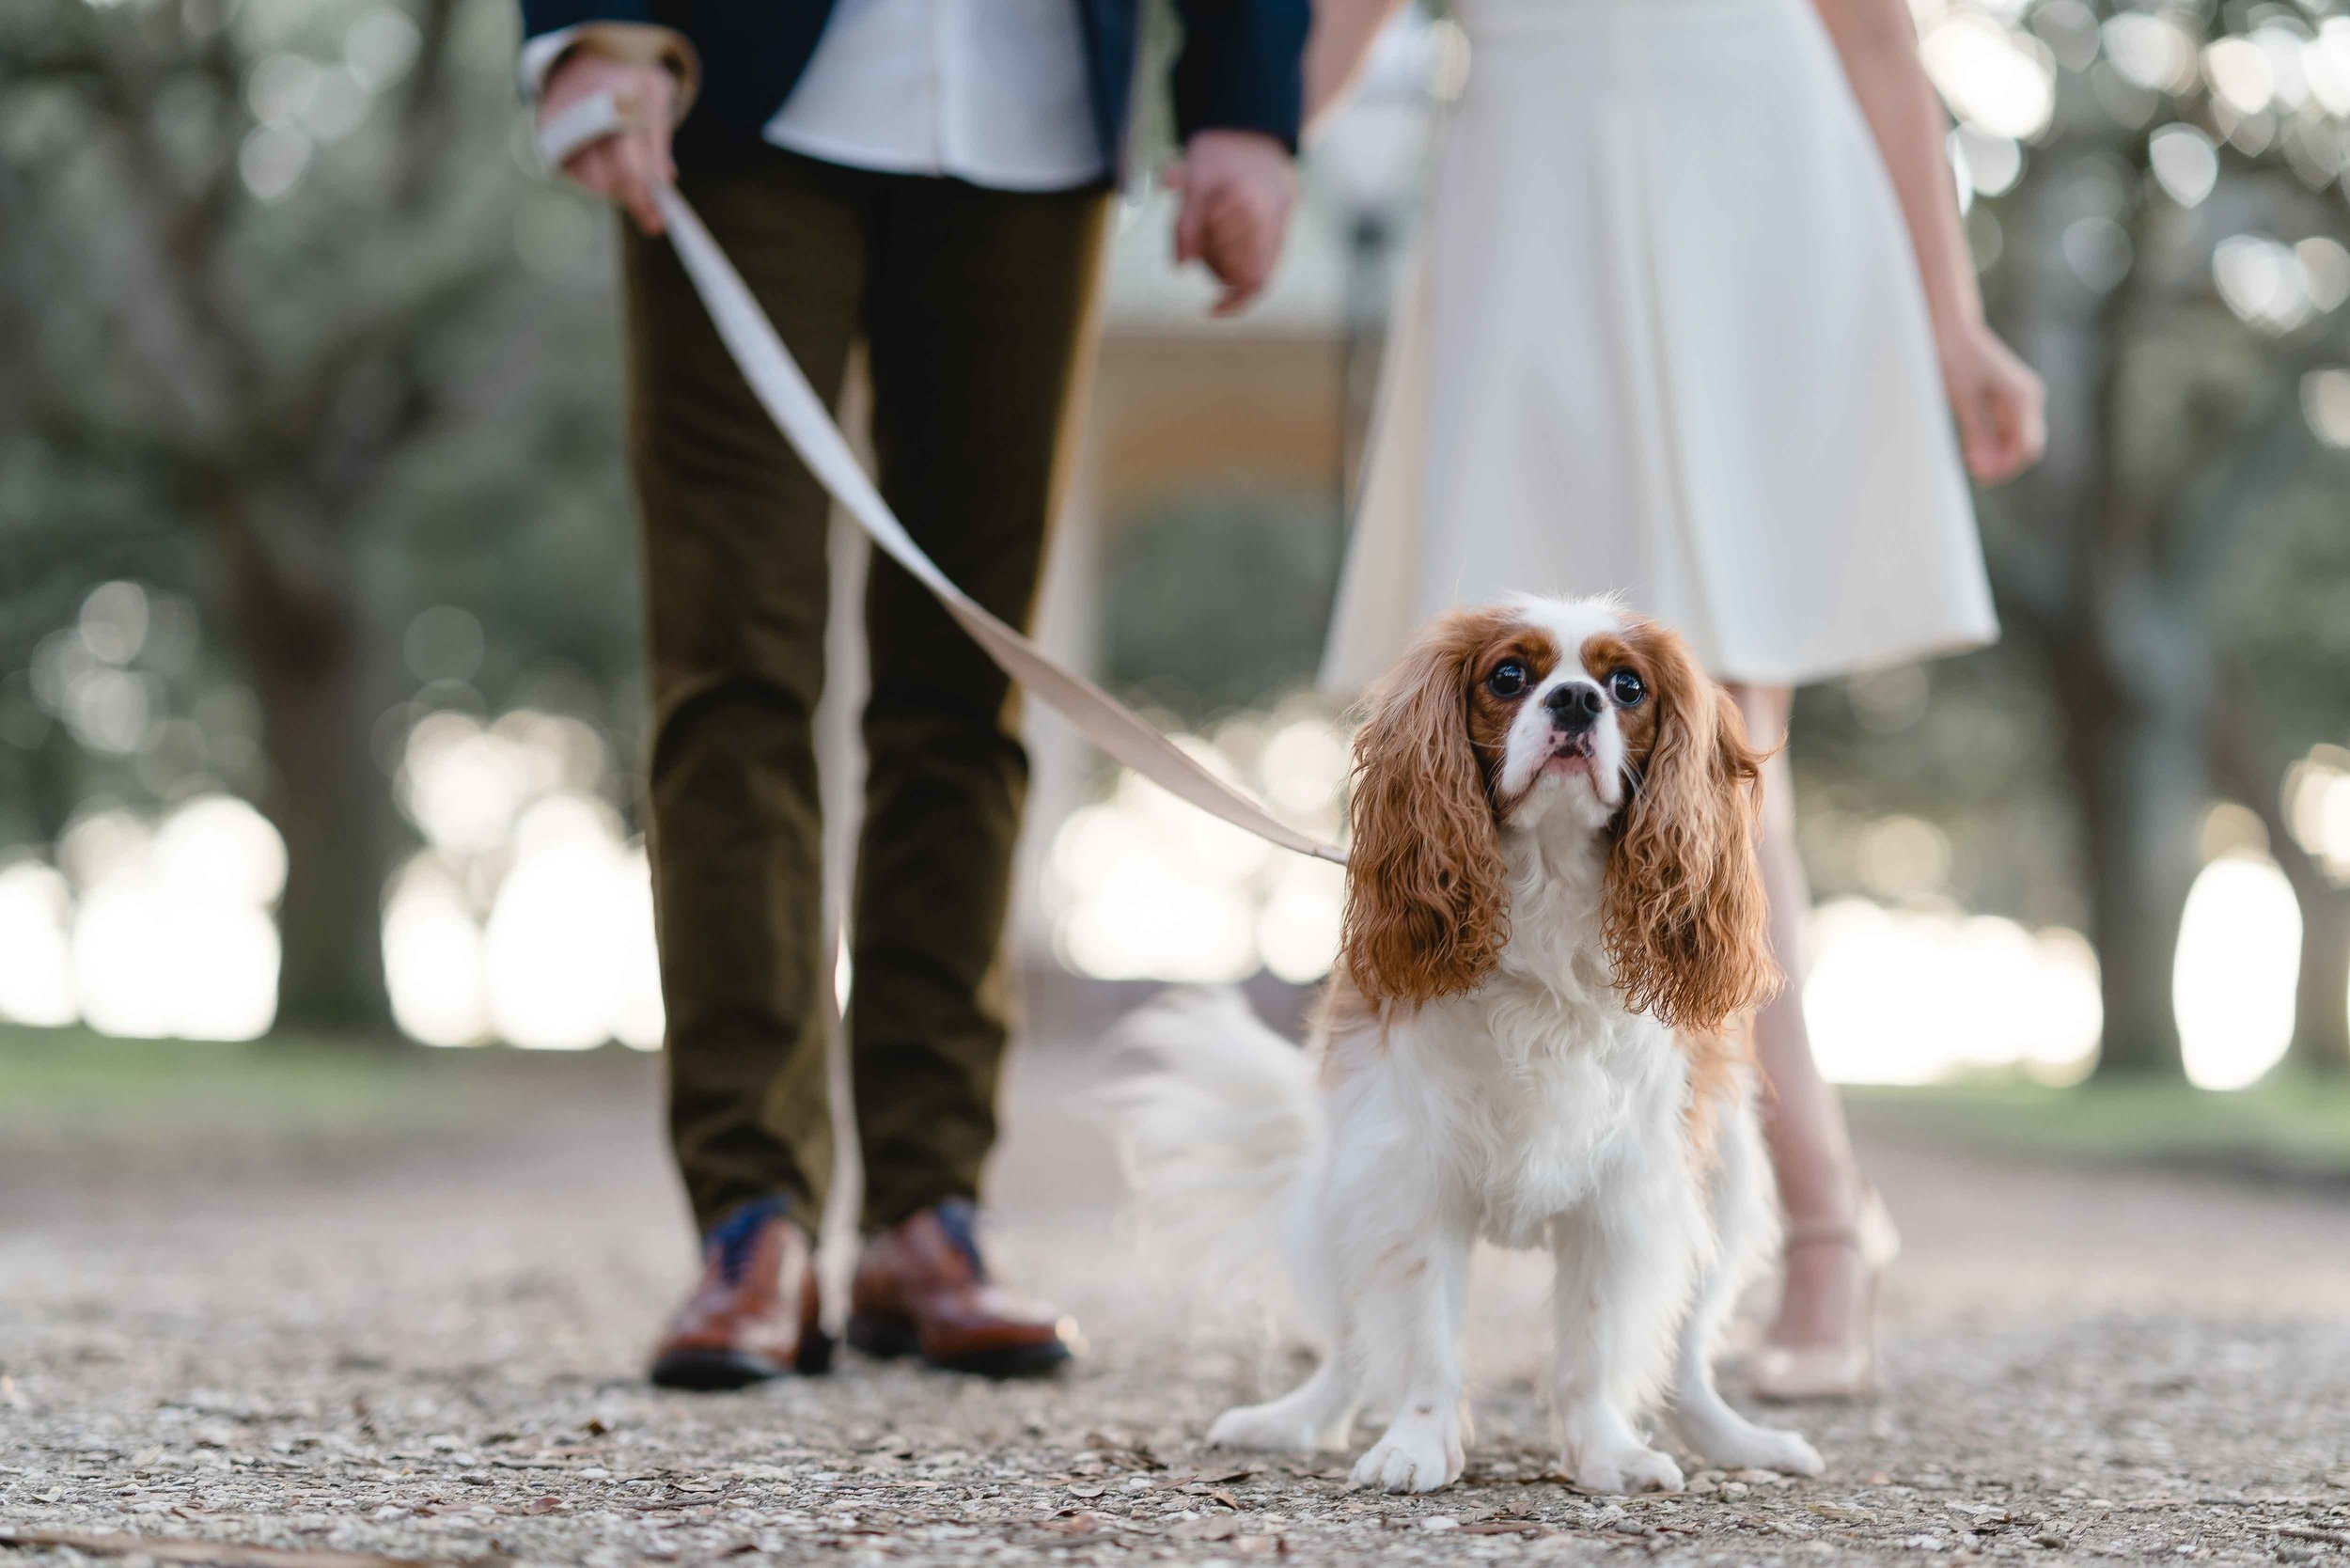 Digital_Spark_Weddings_Photo_Charleston_Charlotte_NC1.jpg